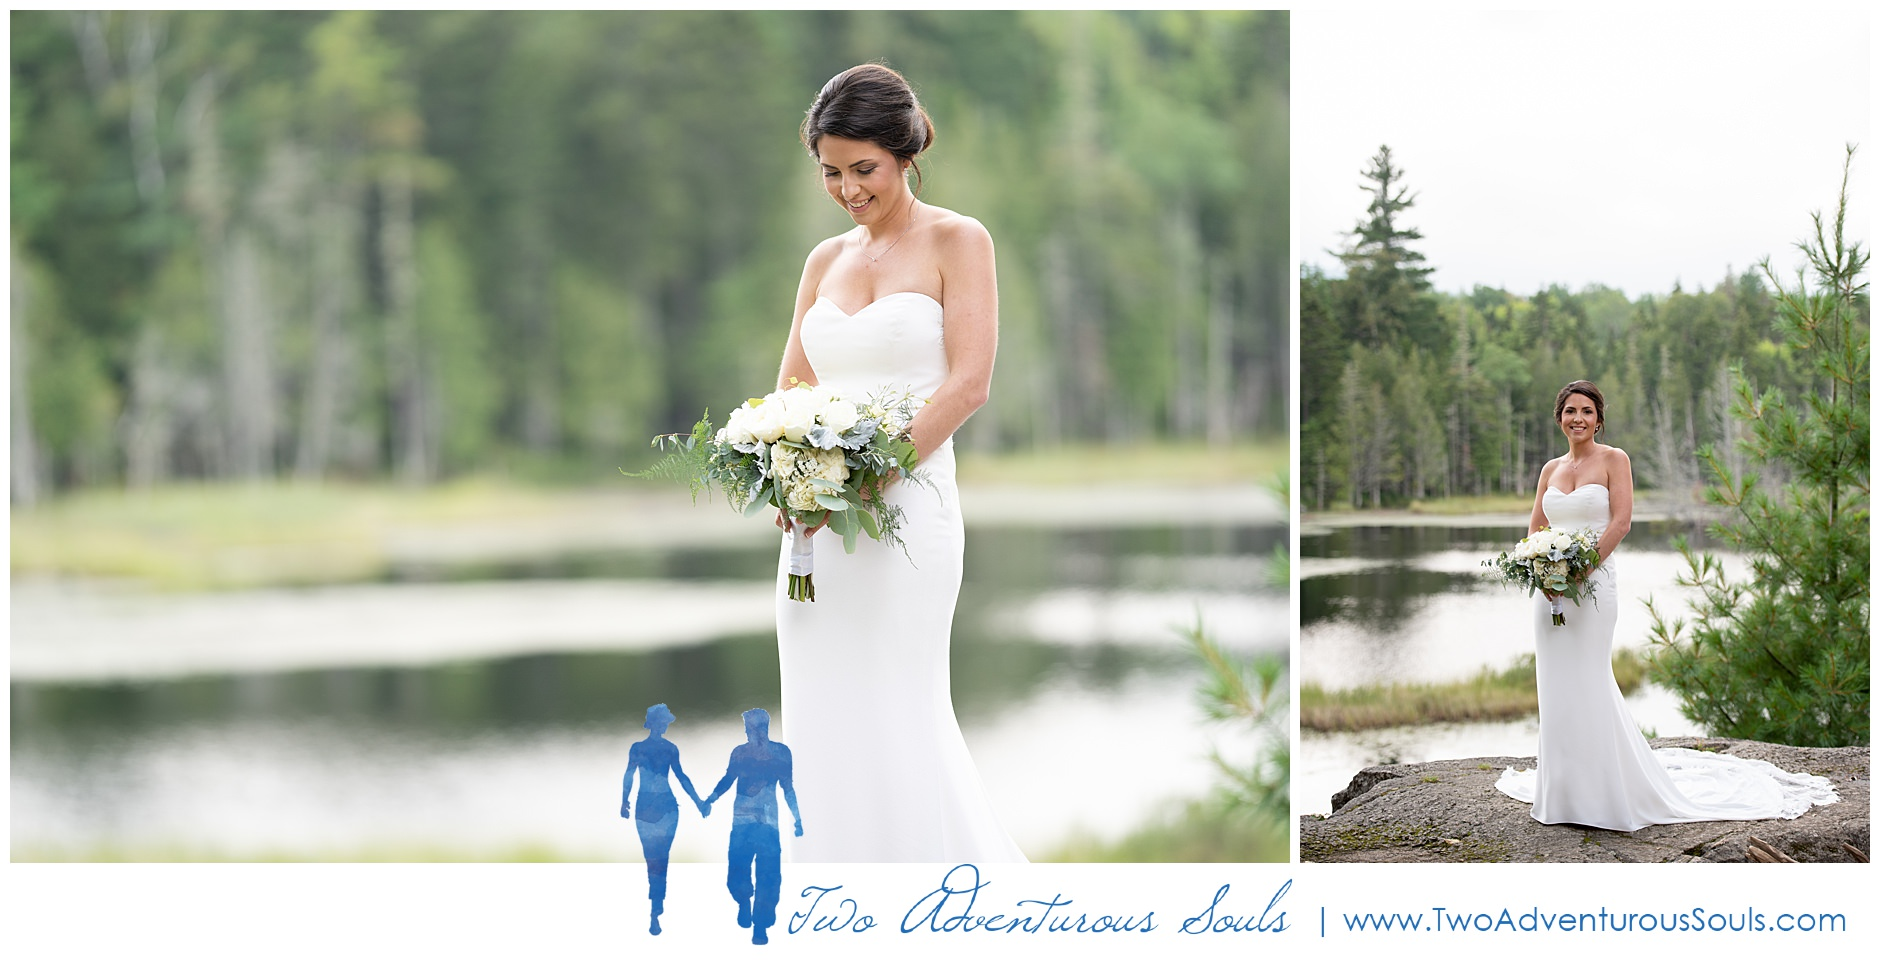 Sugarloaf Outdoor Center Wedding Photographers, Destination Wedding Photographers, Two Adventurous Souls-081719_0028.jpg